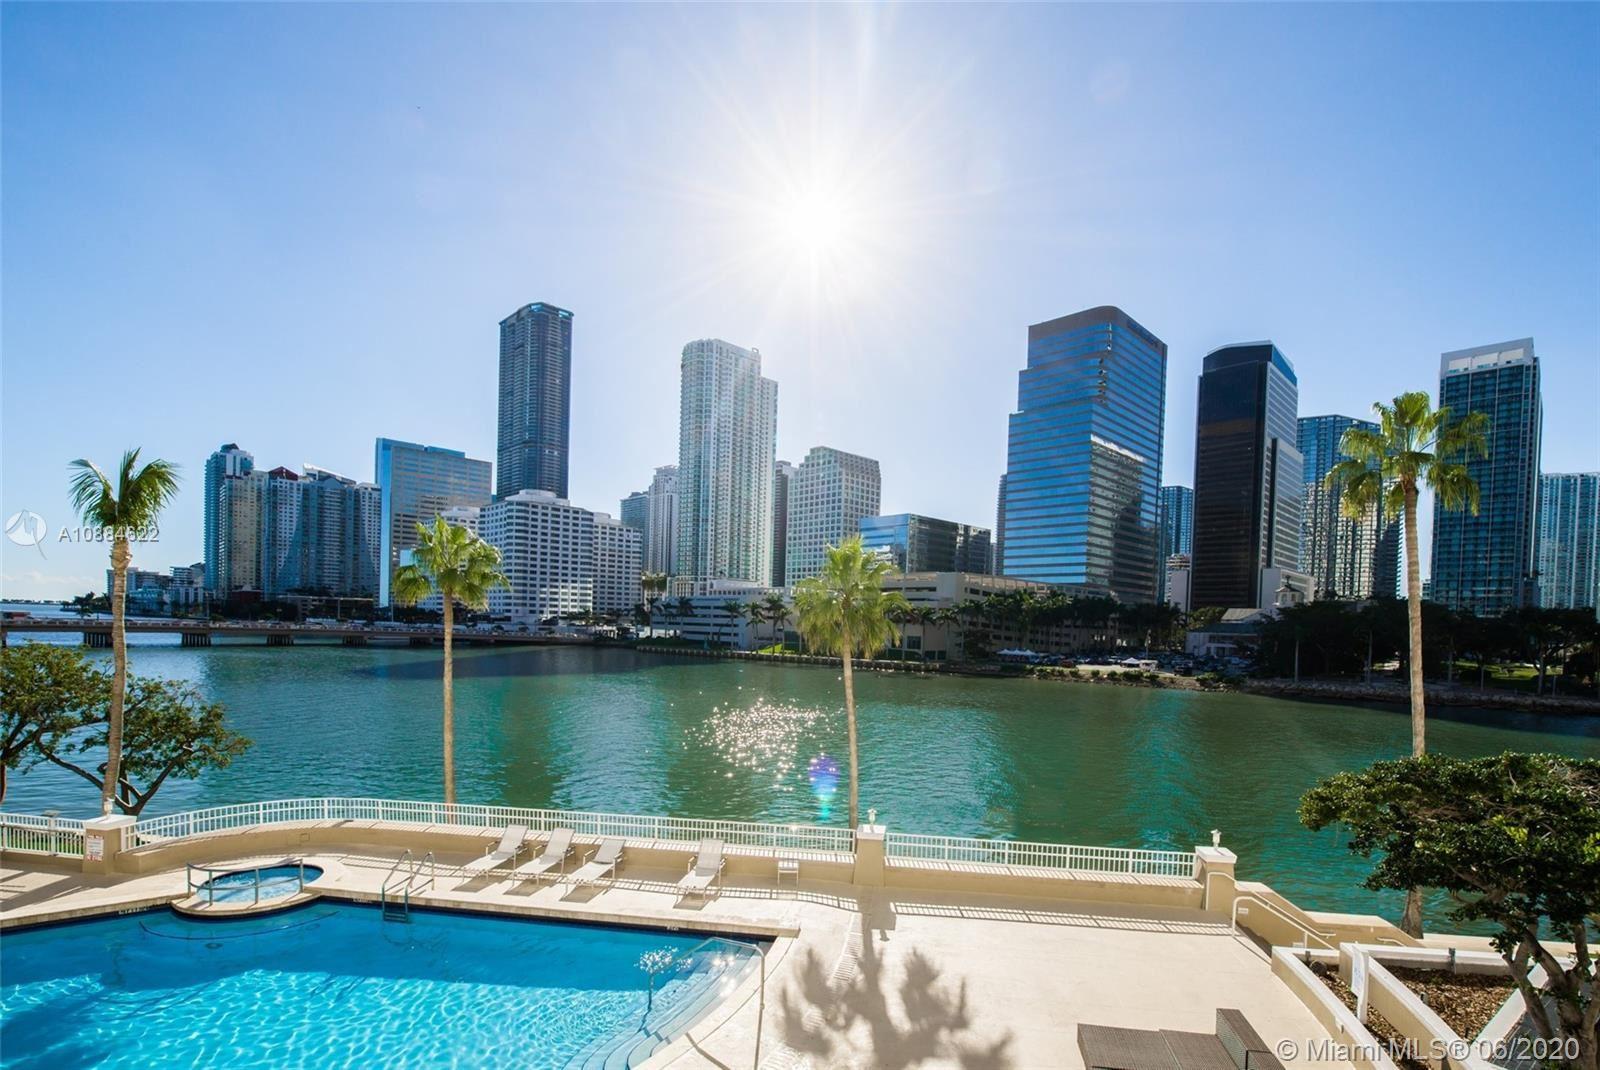 701 Brickell Key Blvd #1707, Miami, FL 33131 - #: A10884622